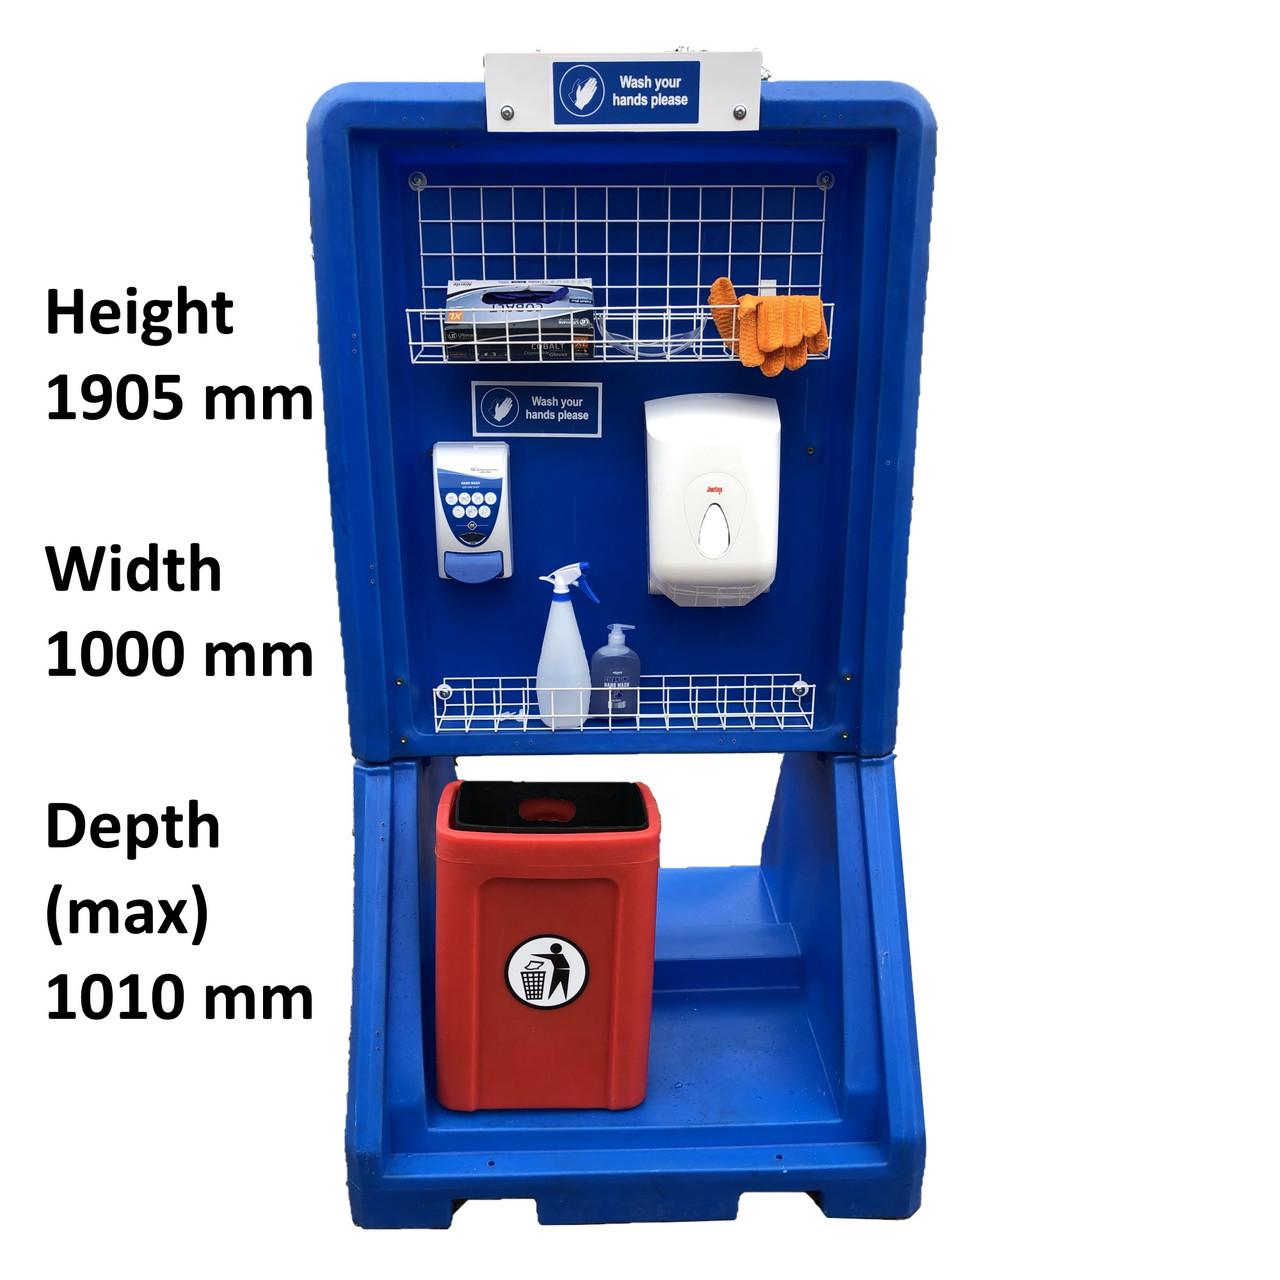 Washpoint freestanding workplace hand wash sanitiser station